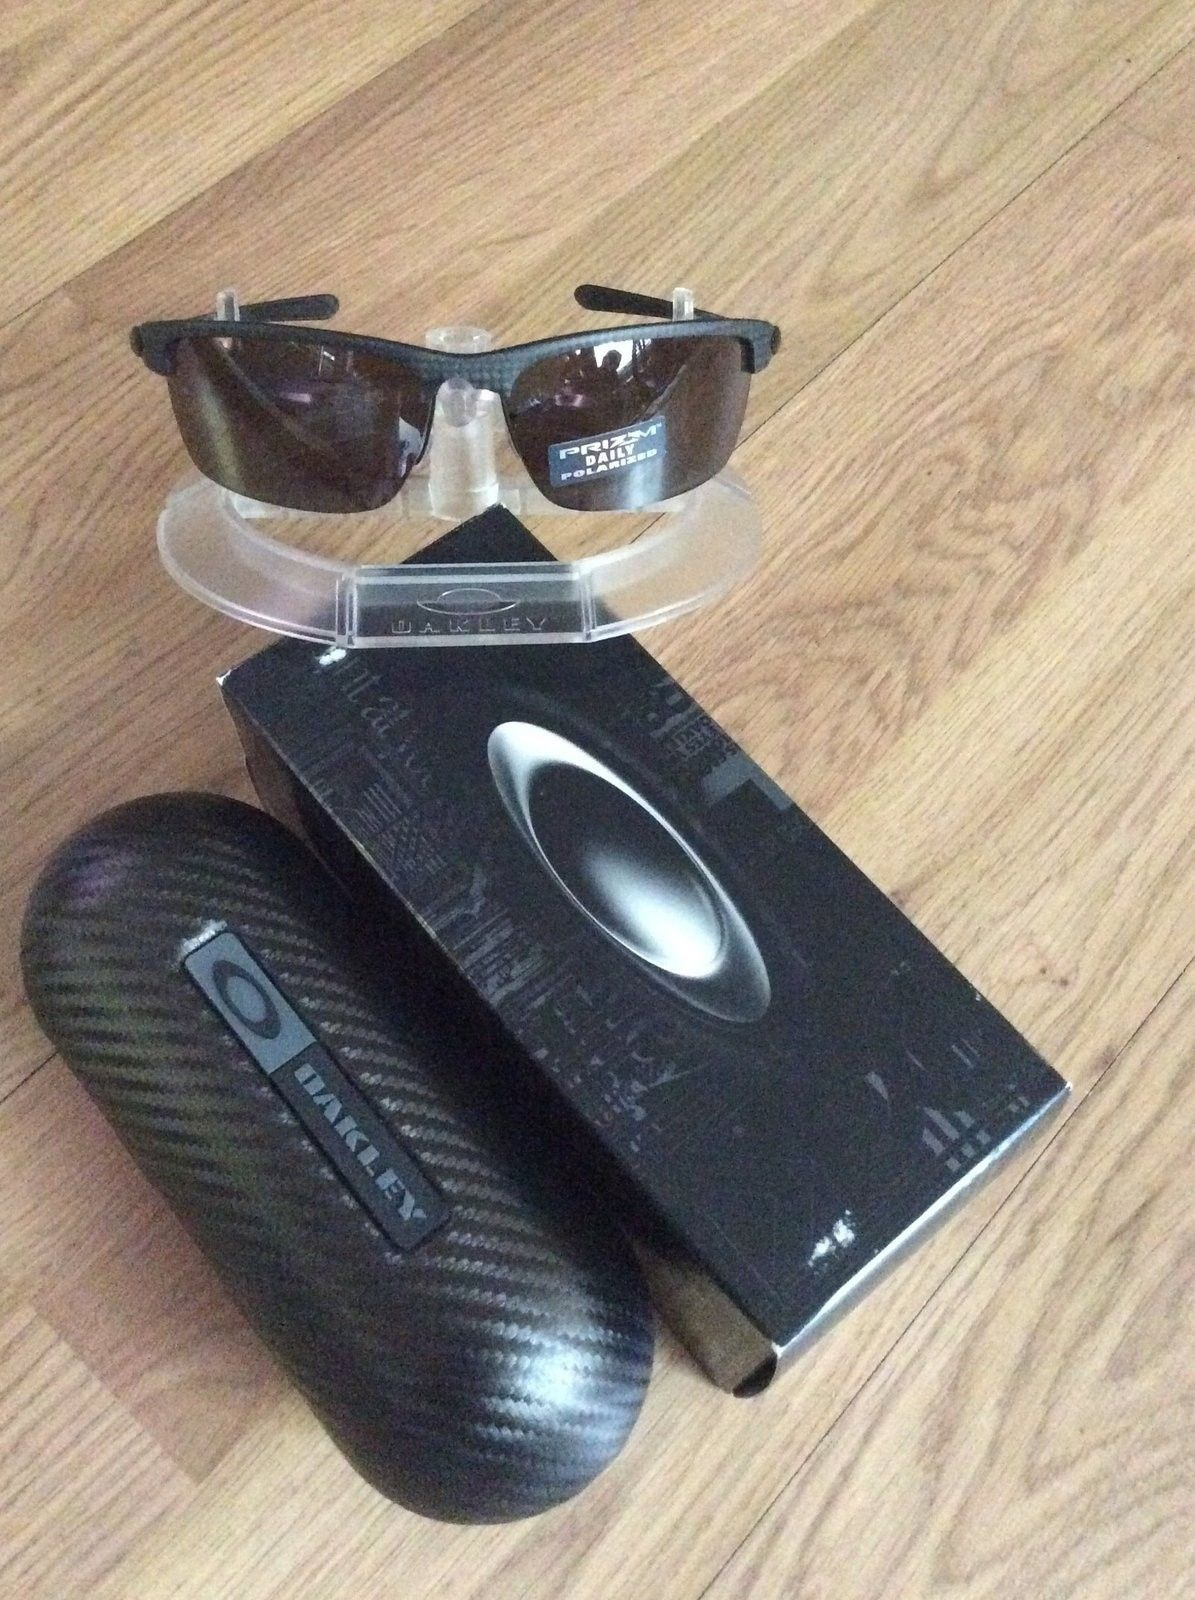 BNIB Carbon Blade Prizm Daily Polar $200 shipped - image.jpg